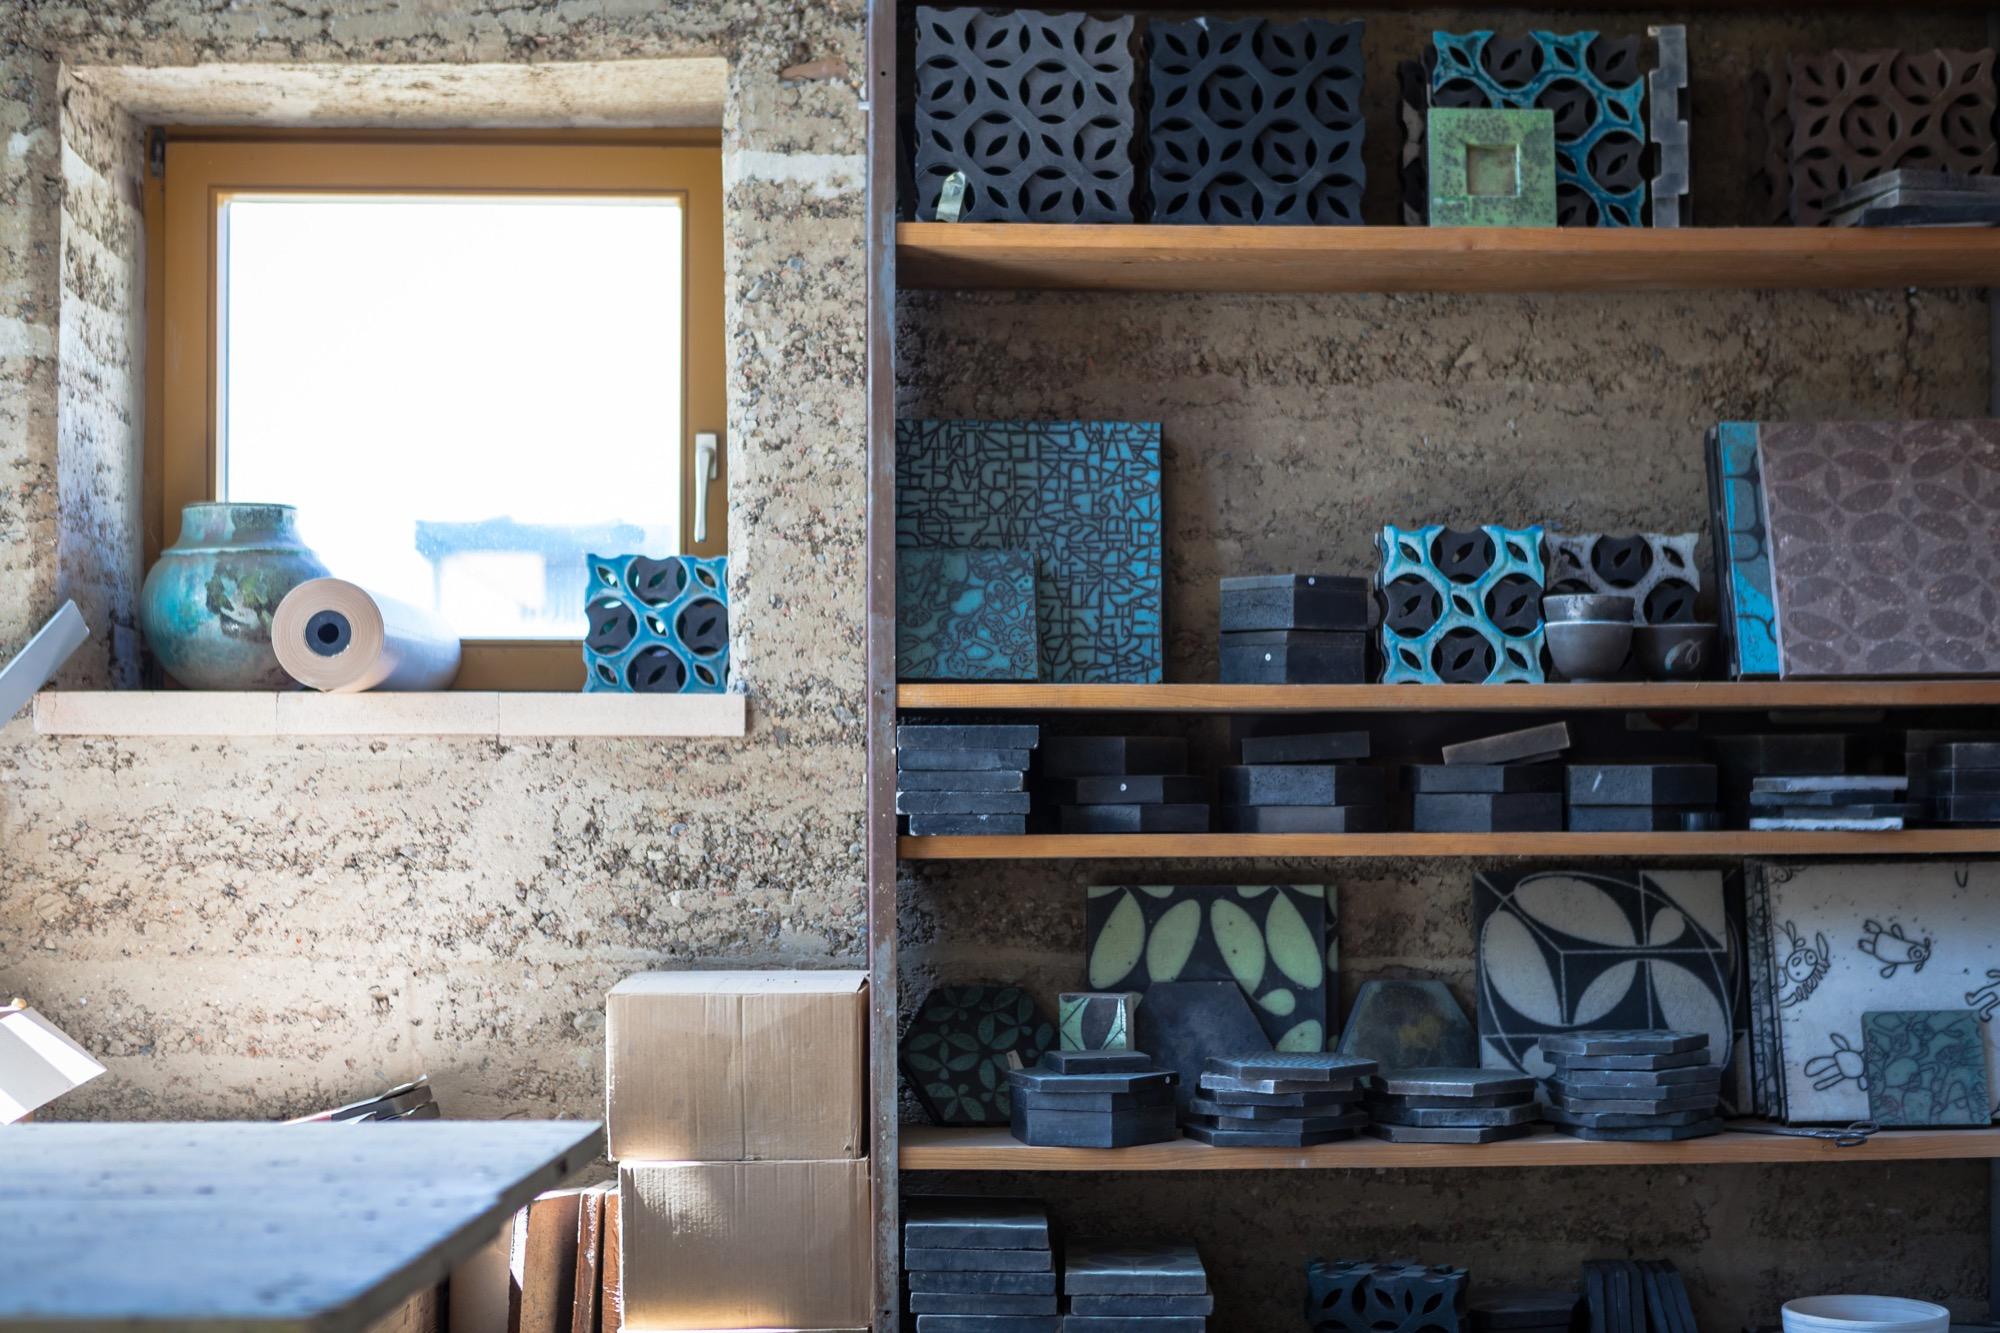 Karak tiles at the Rauch studio